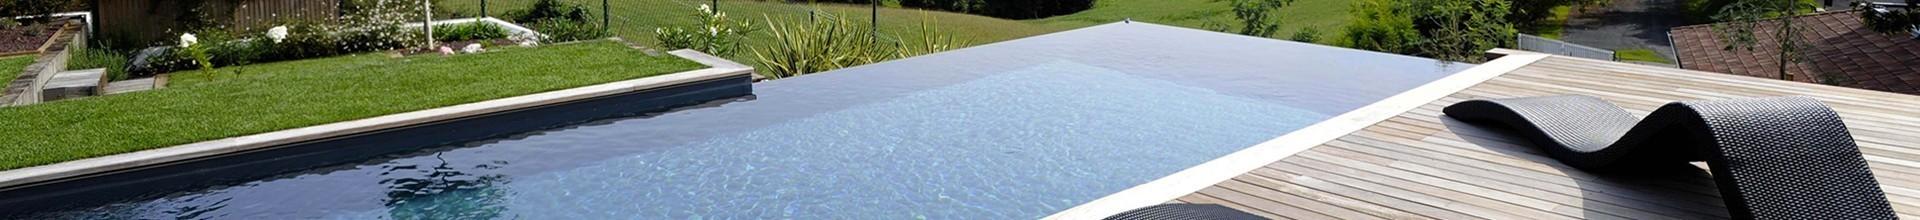 Direct usine, piscine coque prix Haut de France